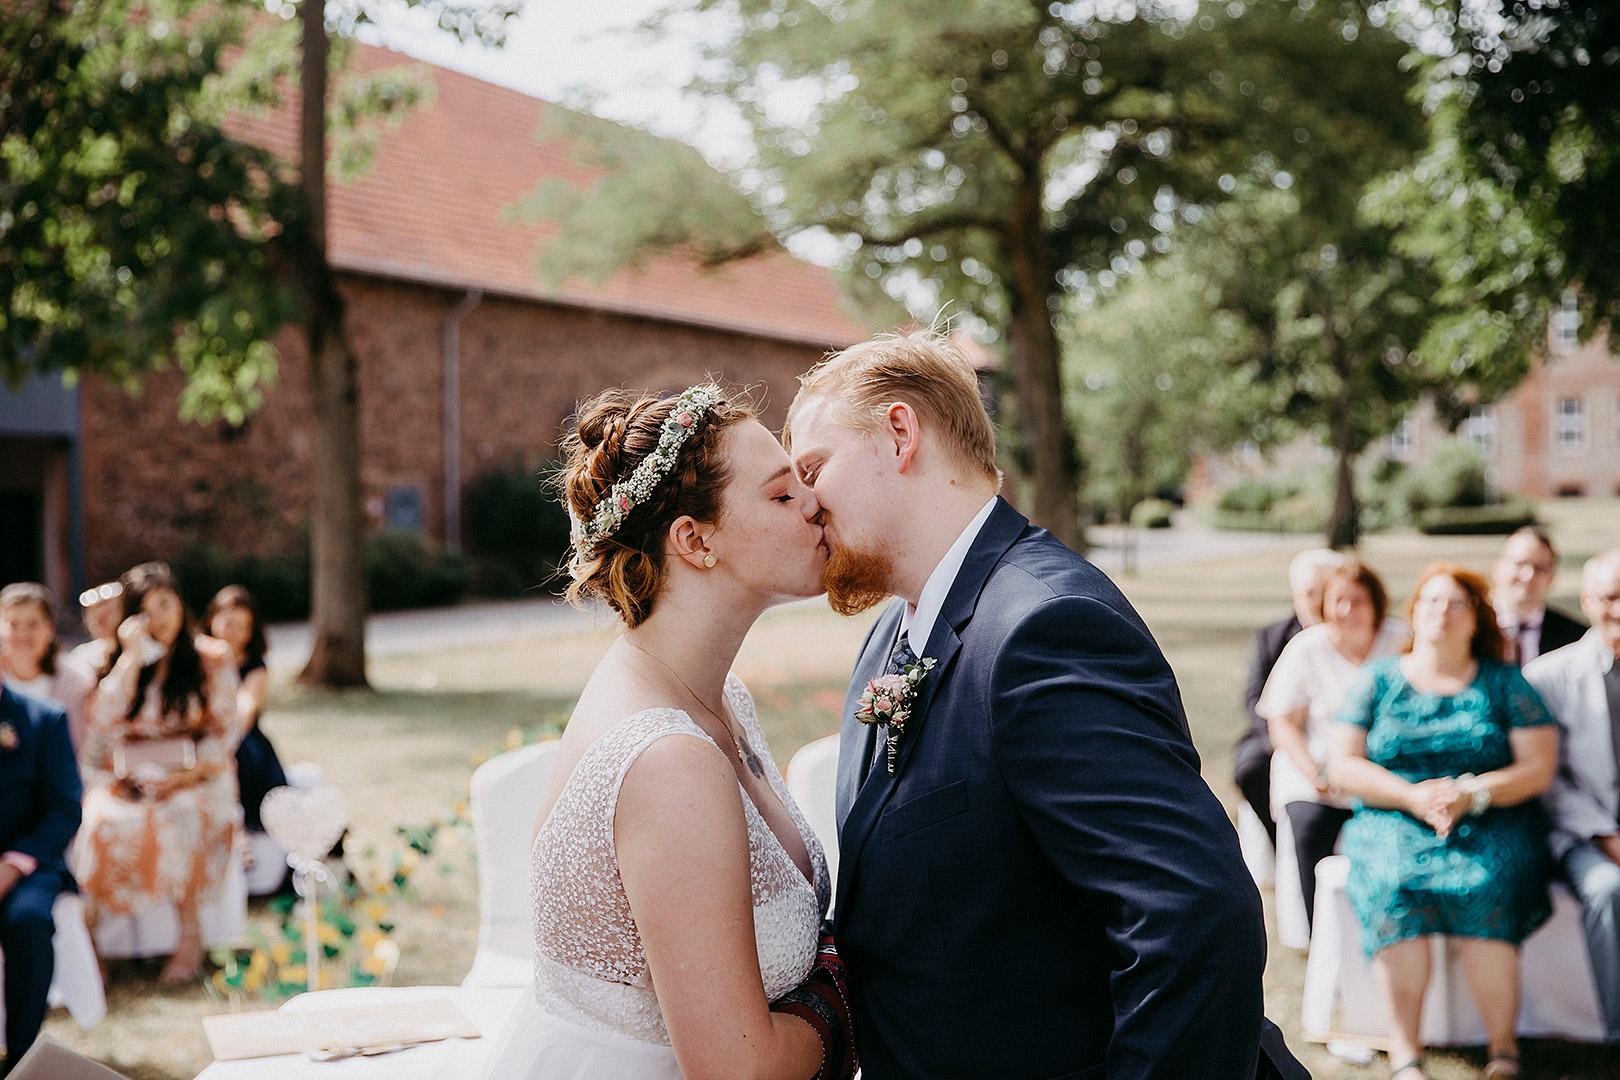 portrait_wedding_kathrinundpatrick_30